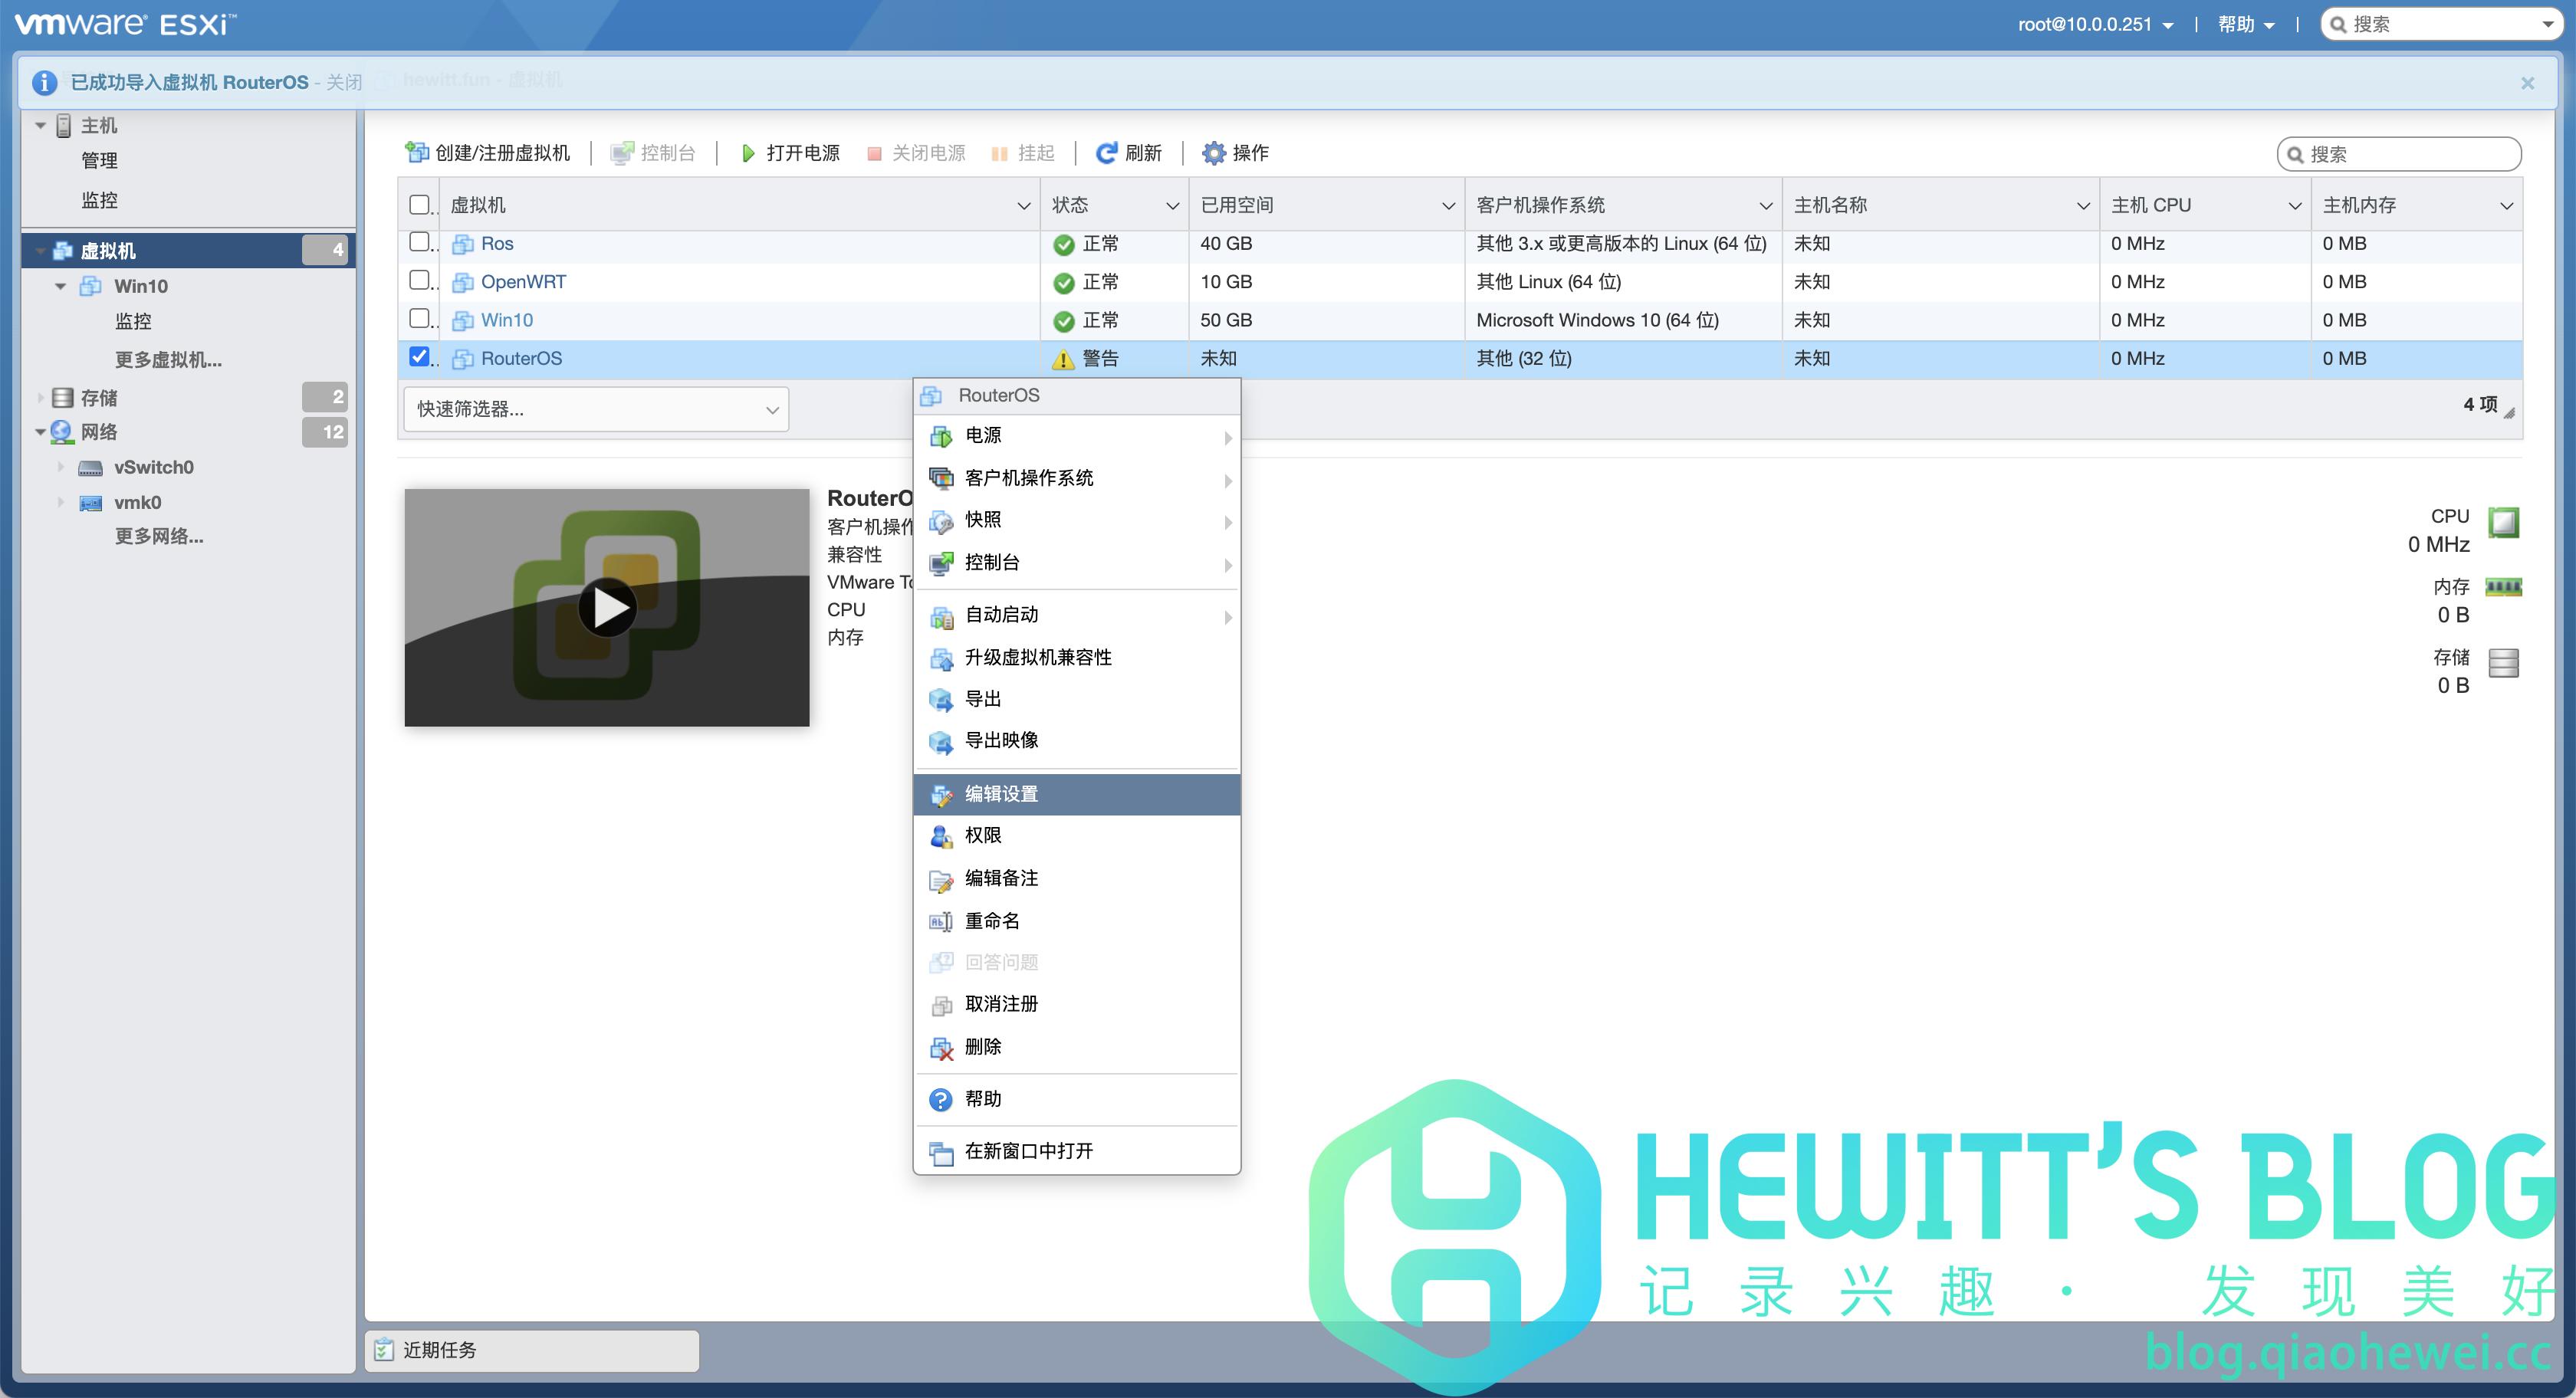 ESXI安装Mikrotik RouterOS(ROS)软路由部署指南(附授权镜像下载)插图23